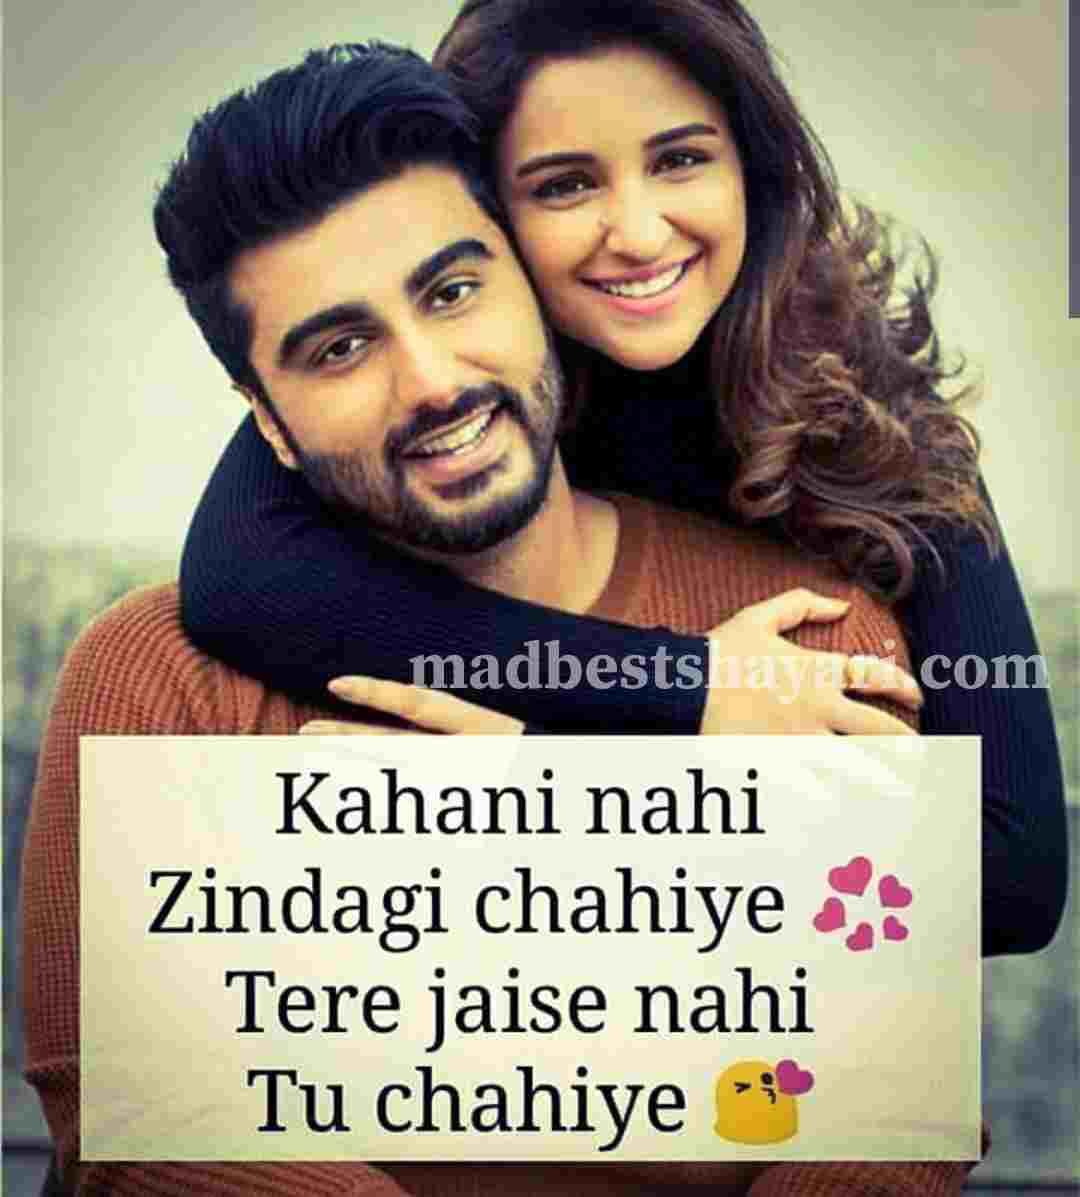 Beautiful Hindi Love Shayari Image for girlfriend